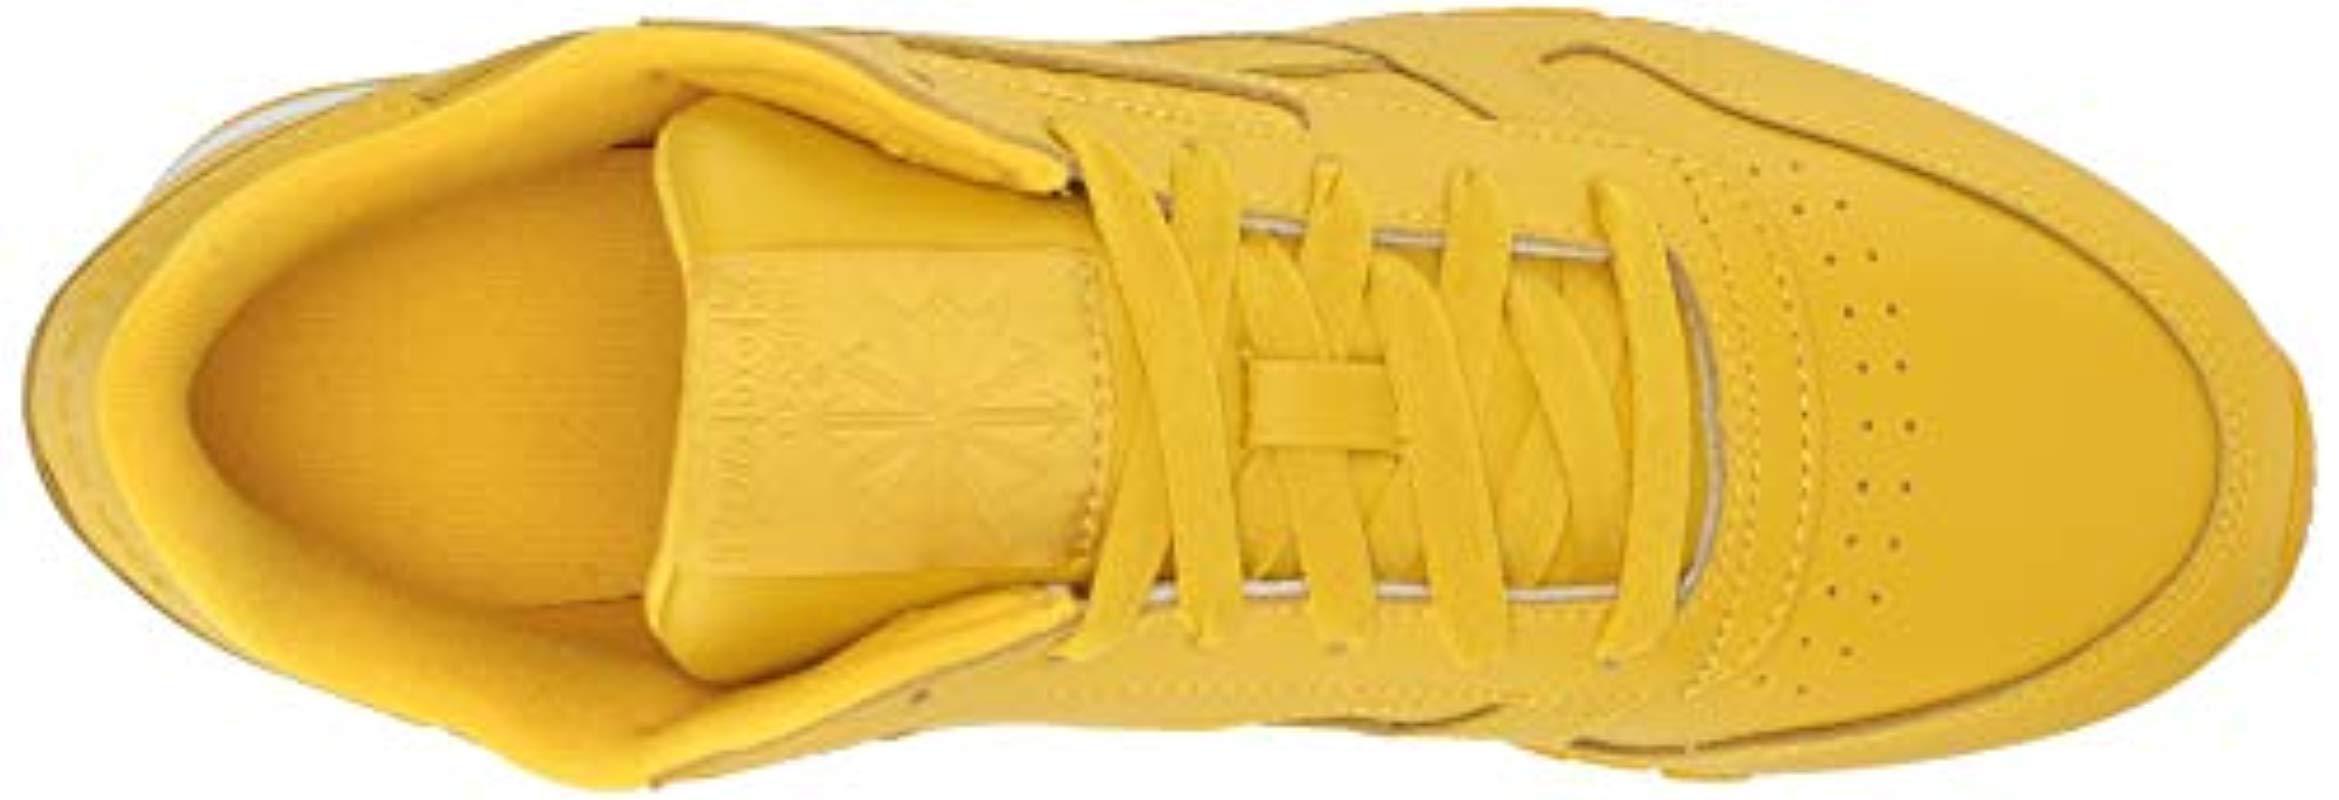 908006106b24b Lyst - Reebok Classic Leather Sneaker in Yellow - Save 22%